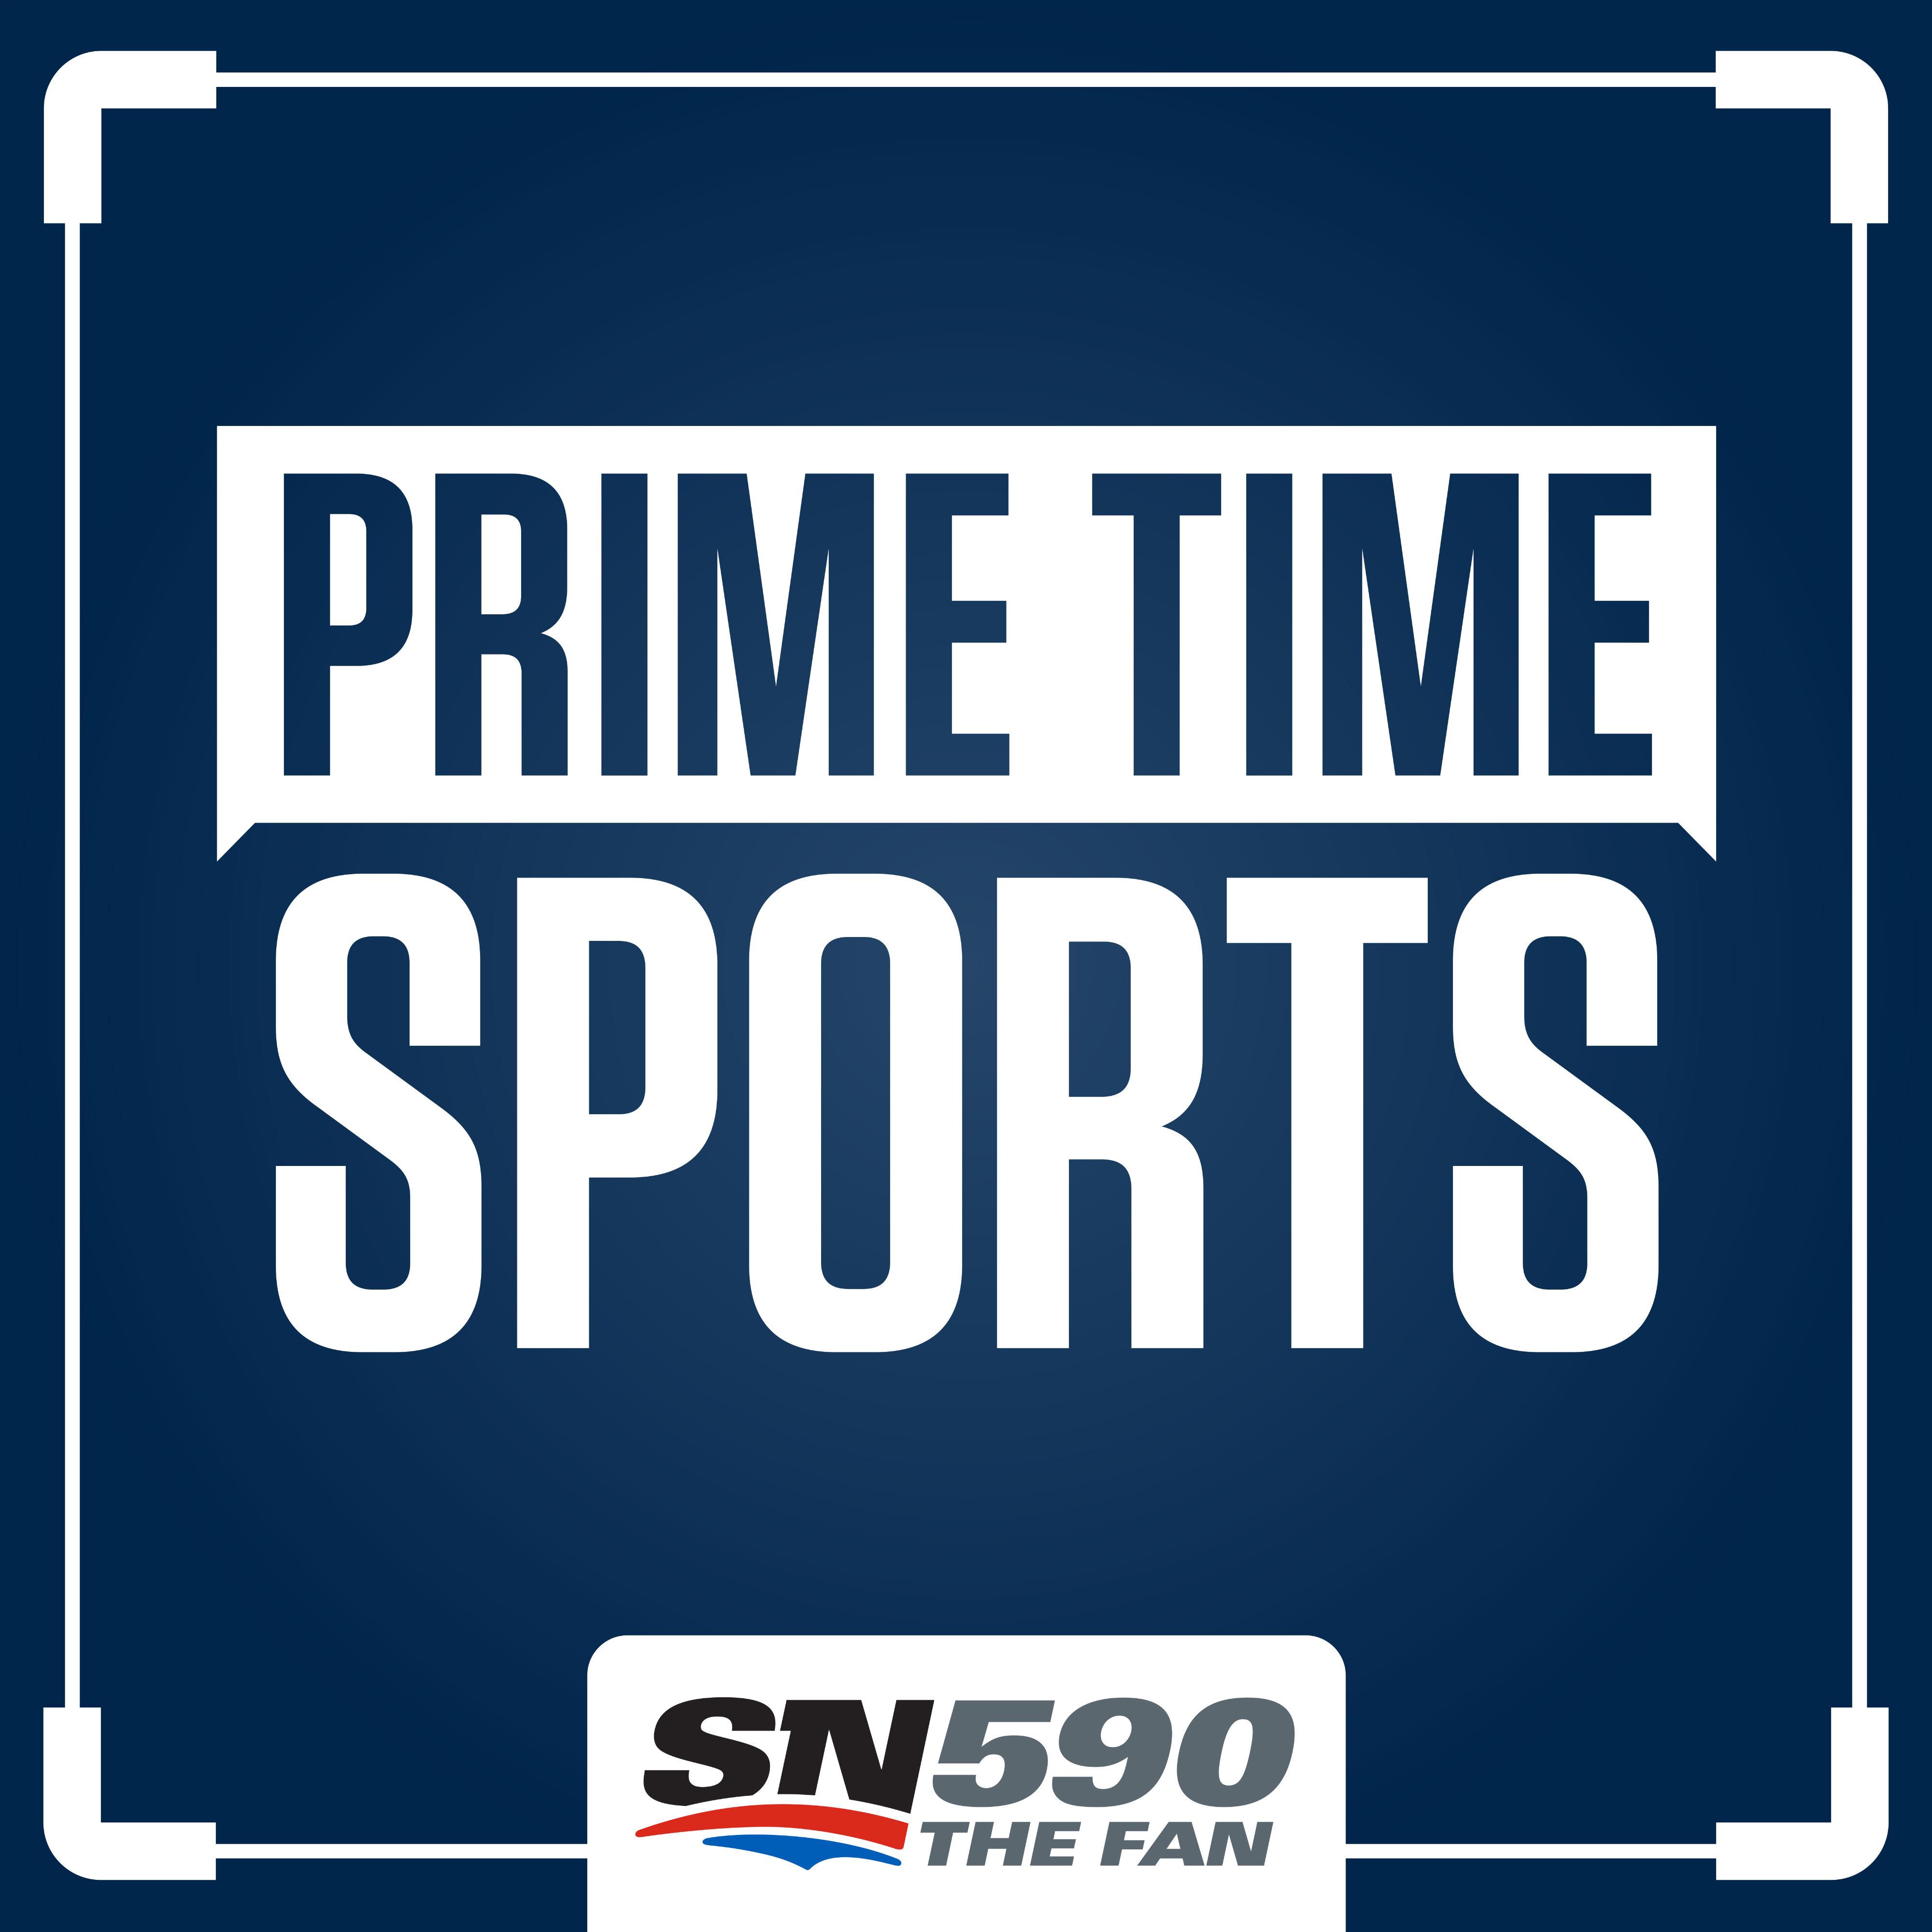 Sn podcasts primetimesports 3000x3000 062019